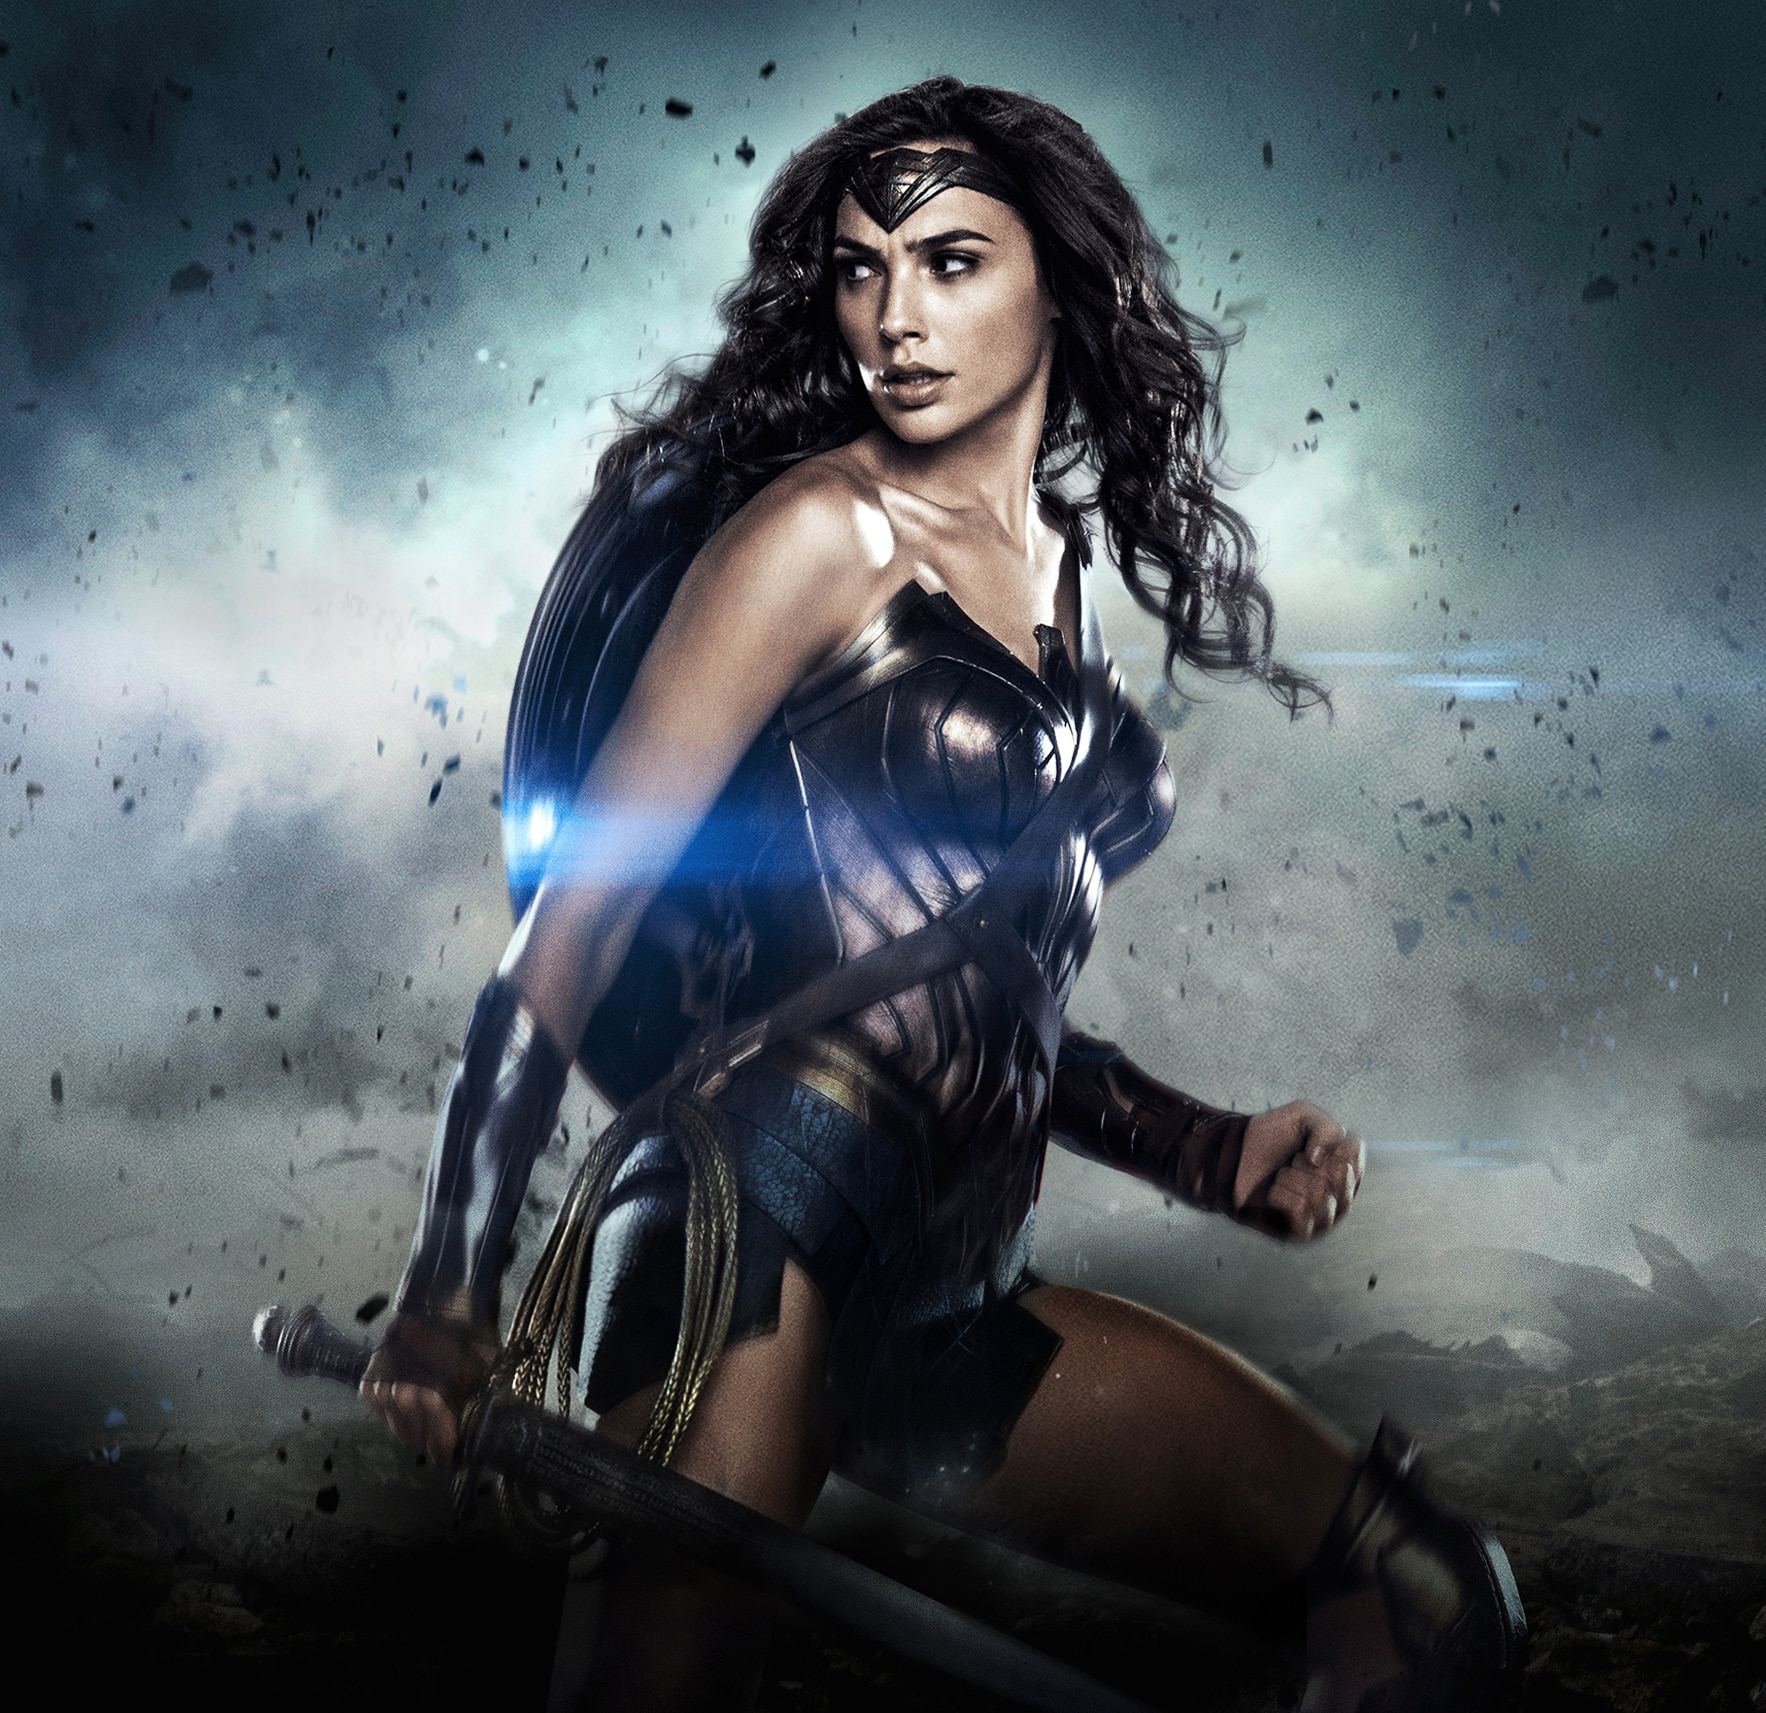 Wonder_Woman_Gal_Gadot-poster